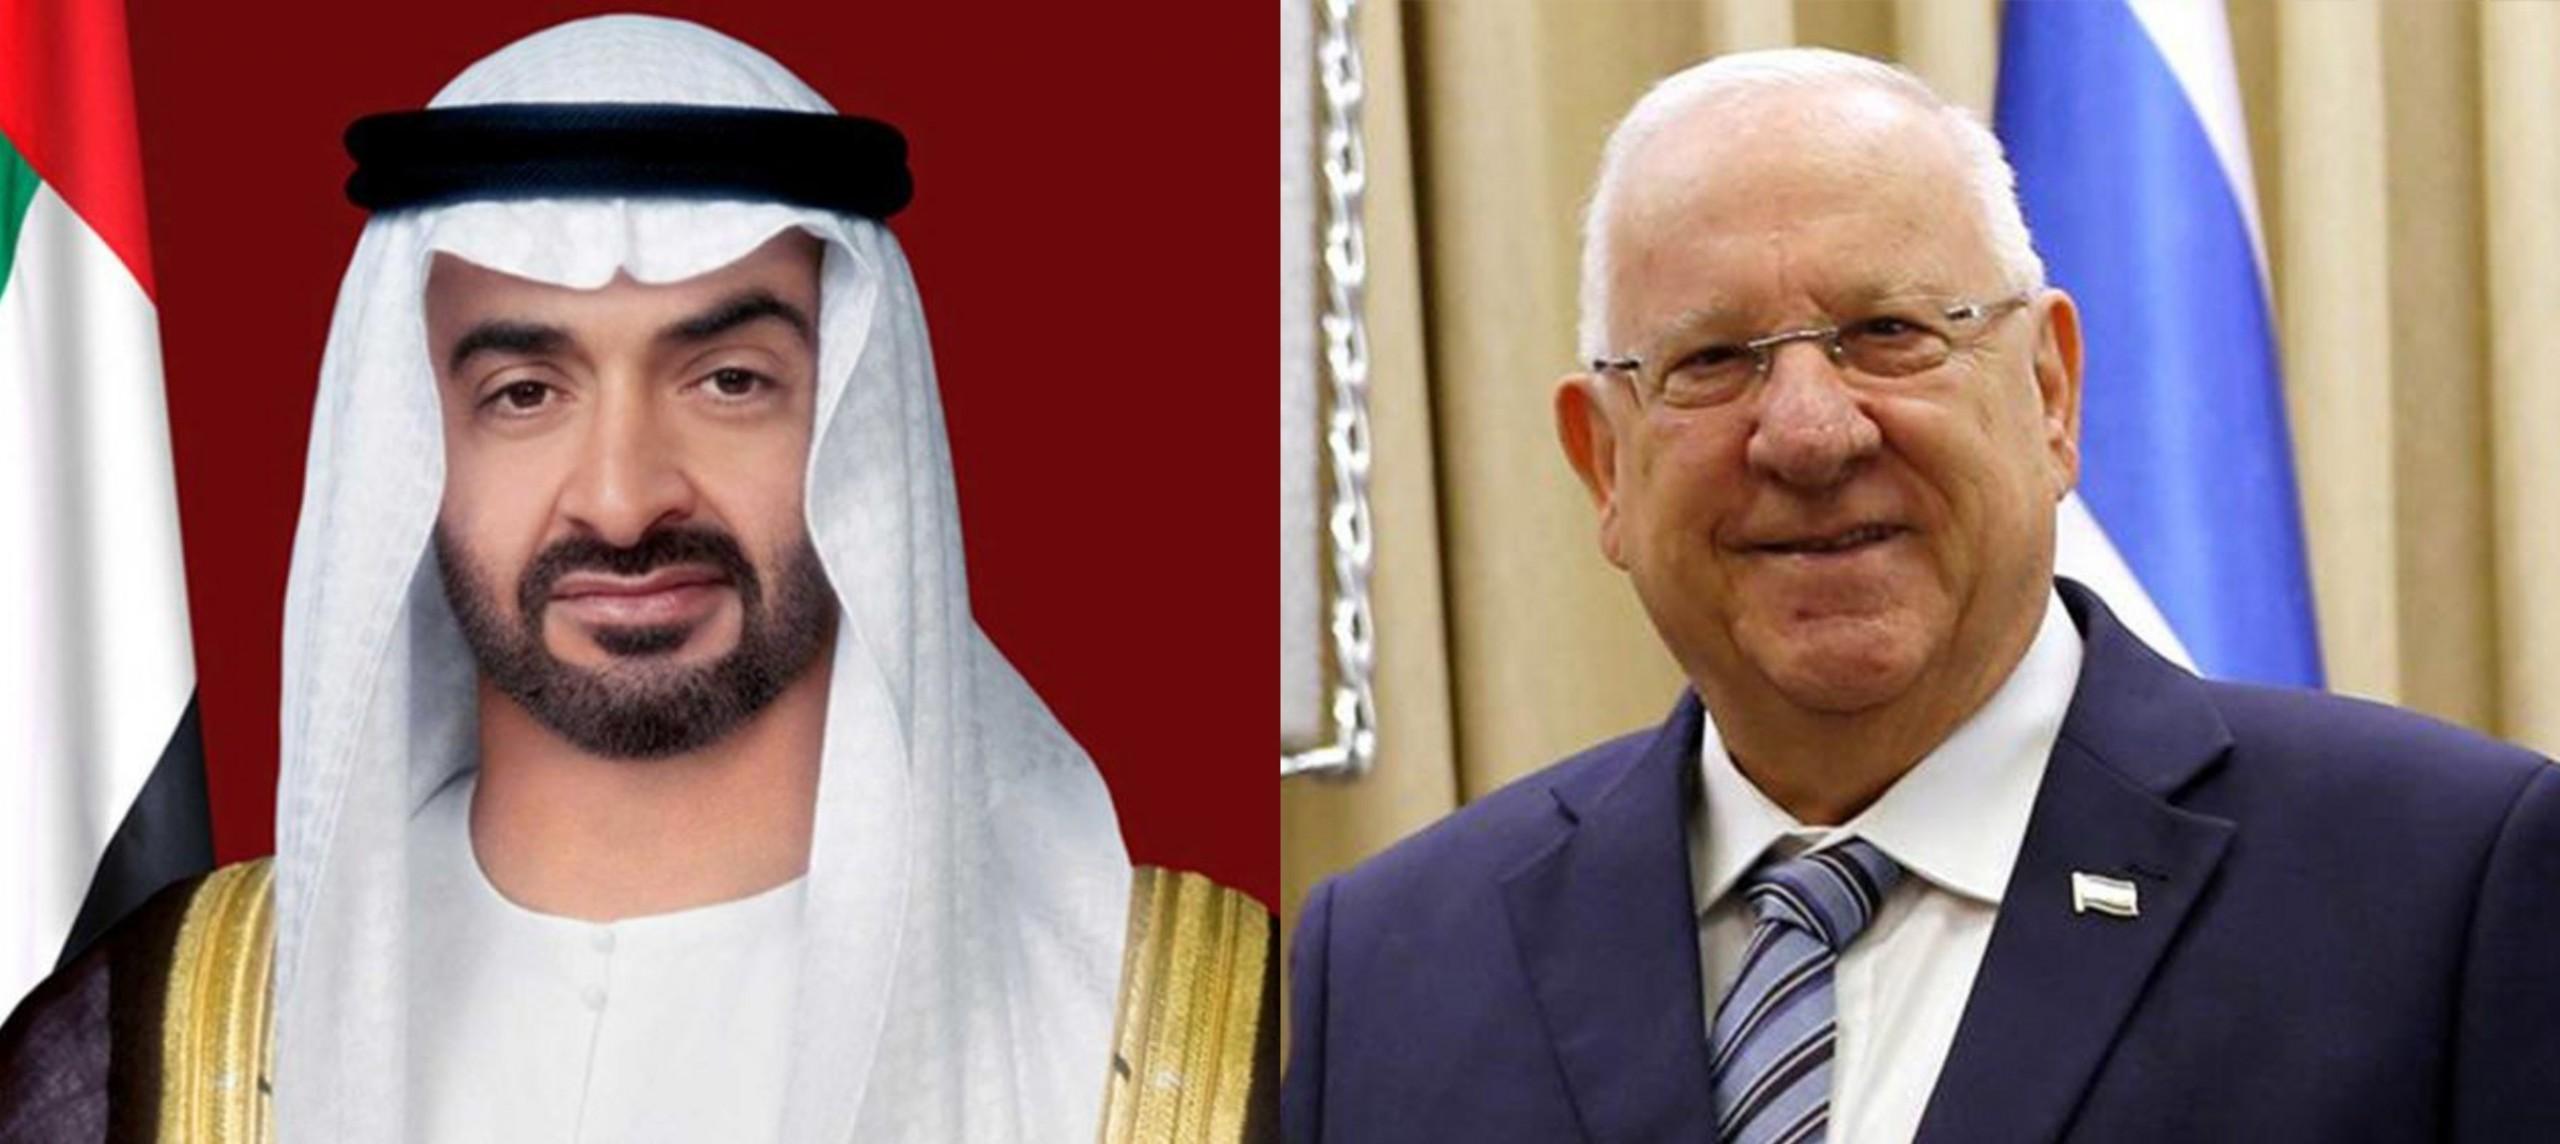 UAE Sheikh Israel President